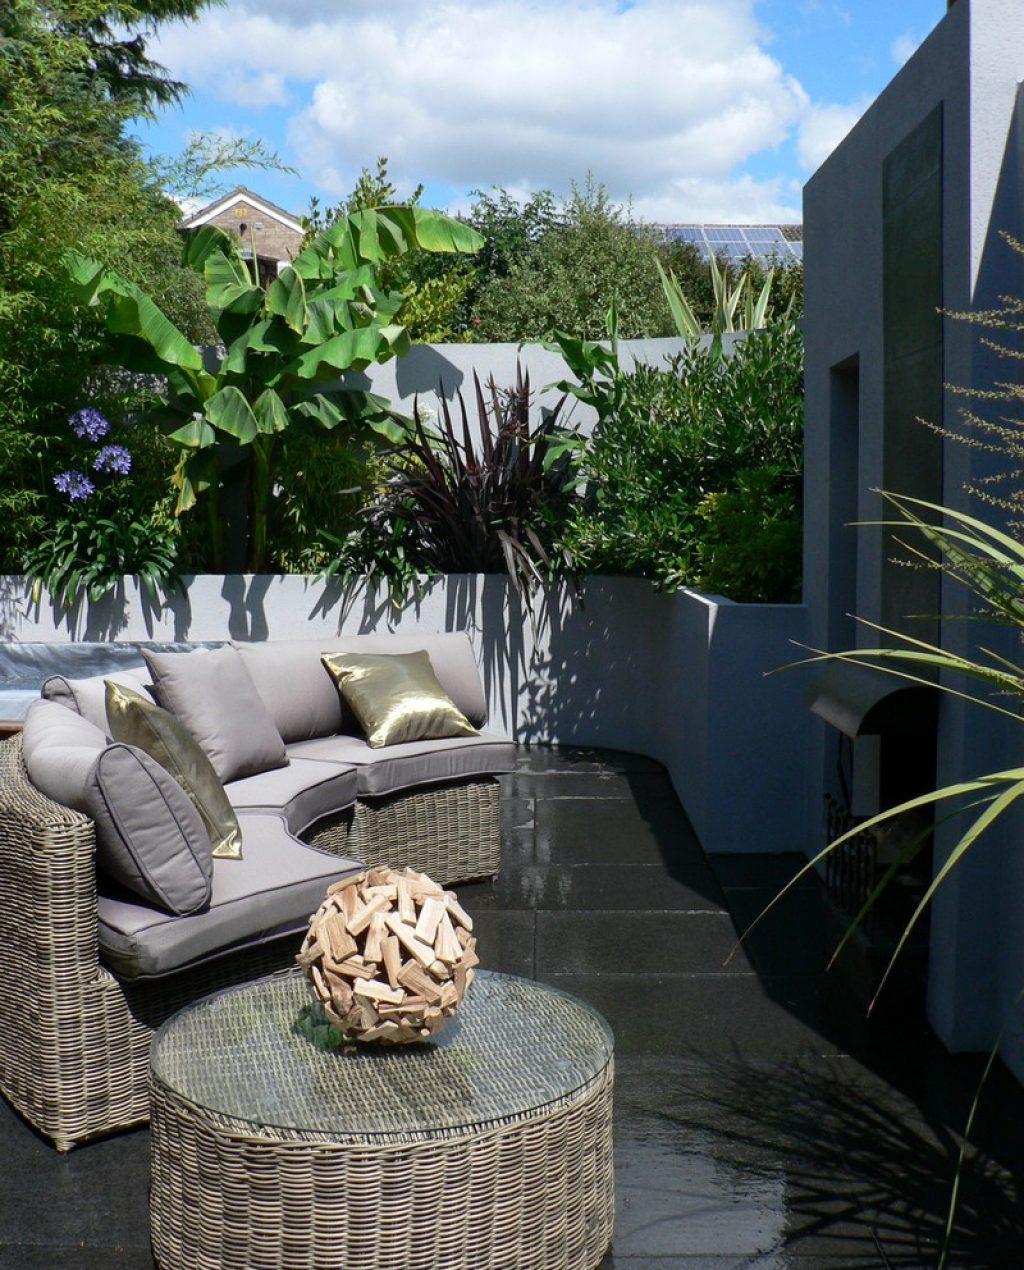 Greenspace Garden Design - Split Level Contemporary Garden - View of split level courtyard